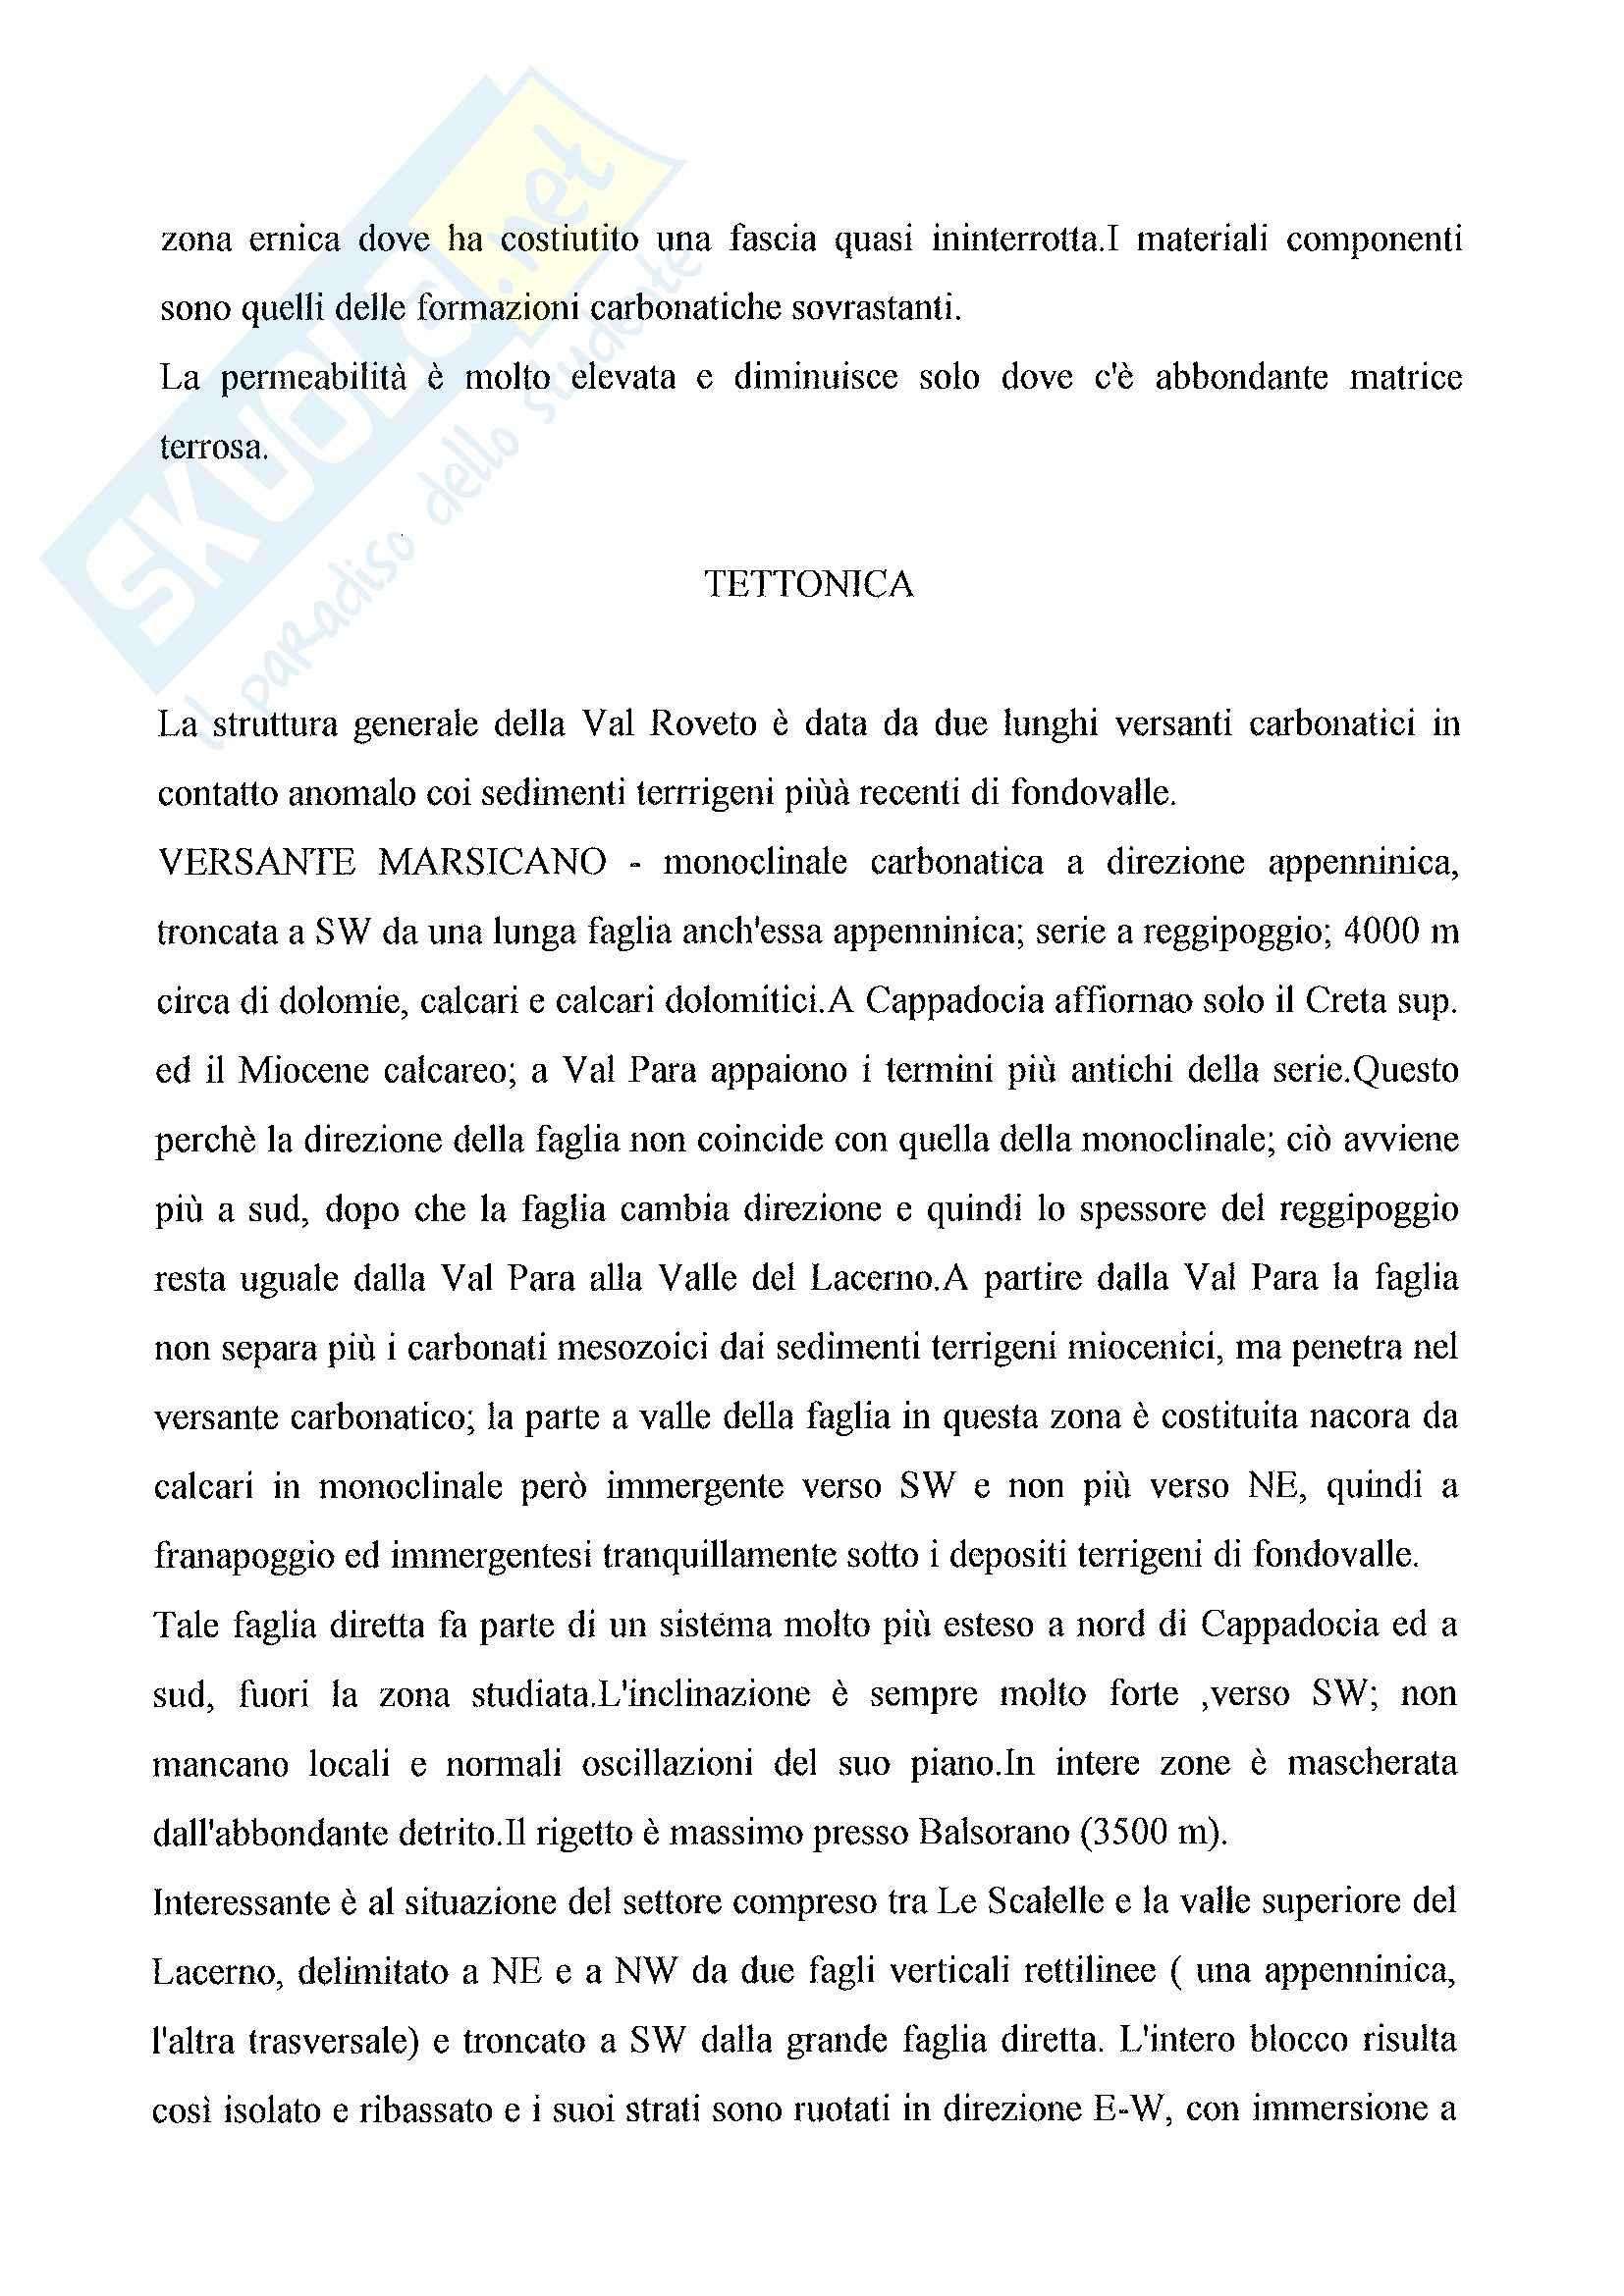 Riassunto esame Idrogeologia: Idrogeologia dell'Alto Bacino del Liri Accordi et Alii, prof. Petitta Pag. 11